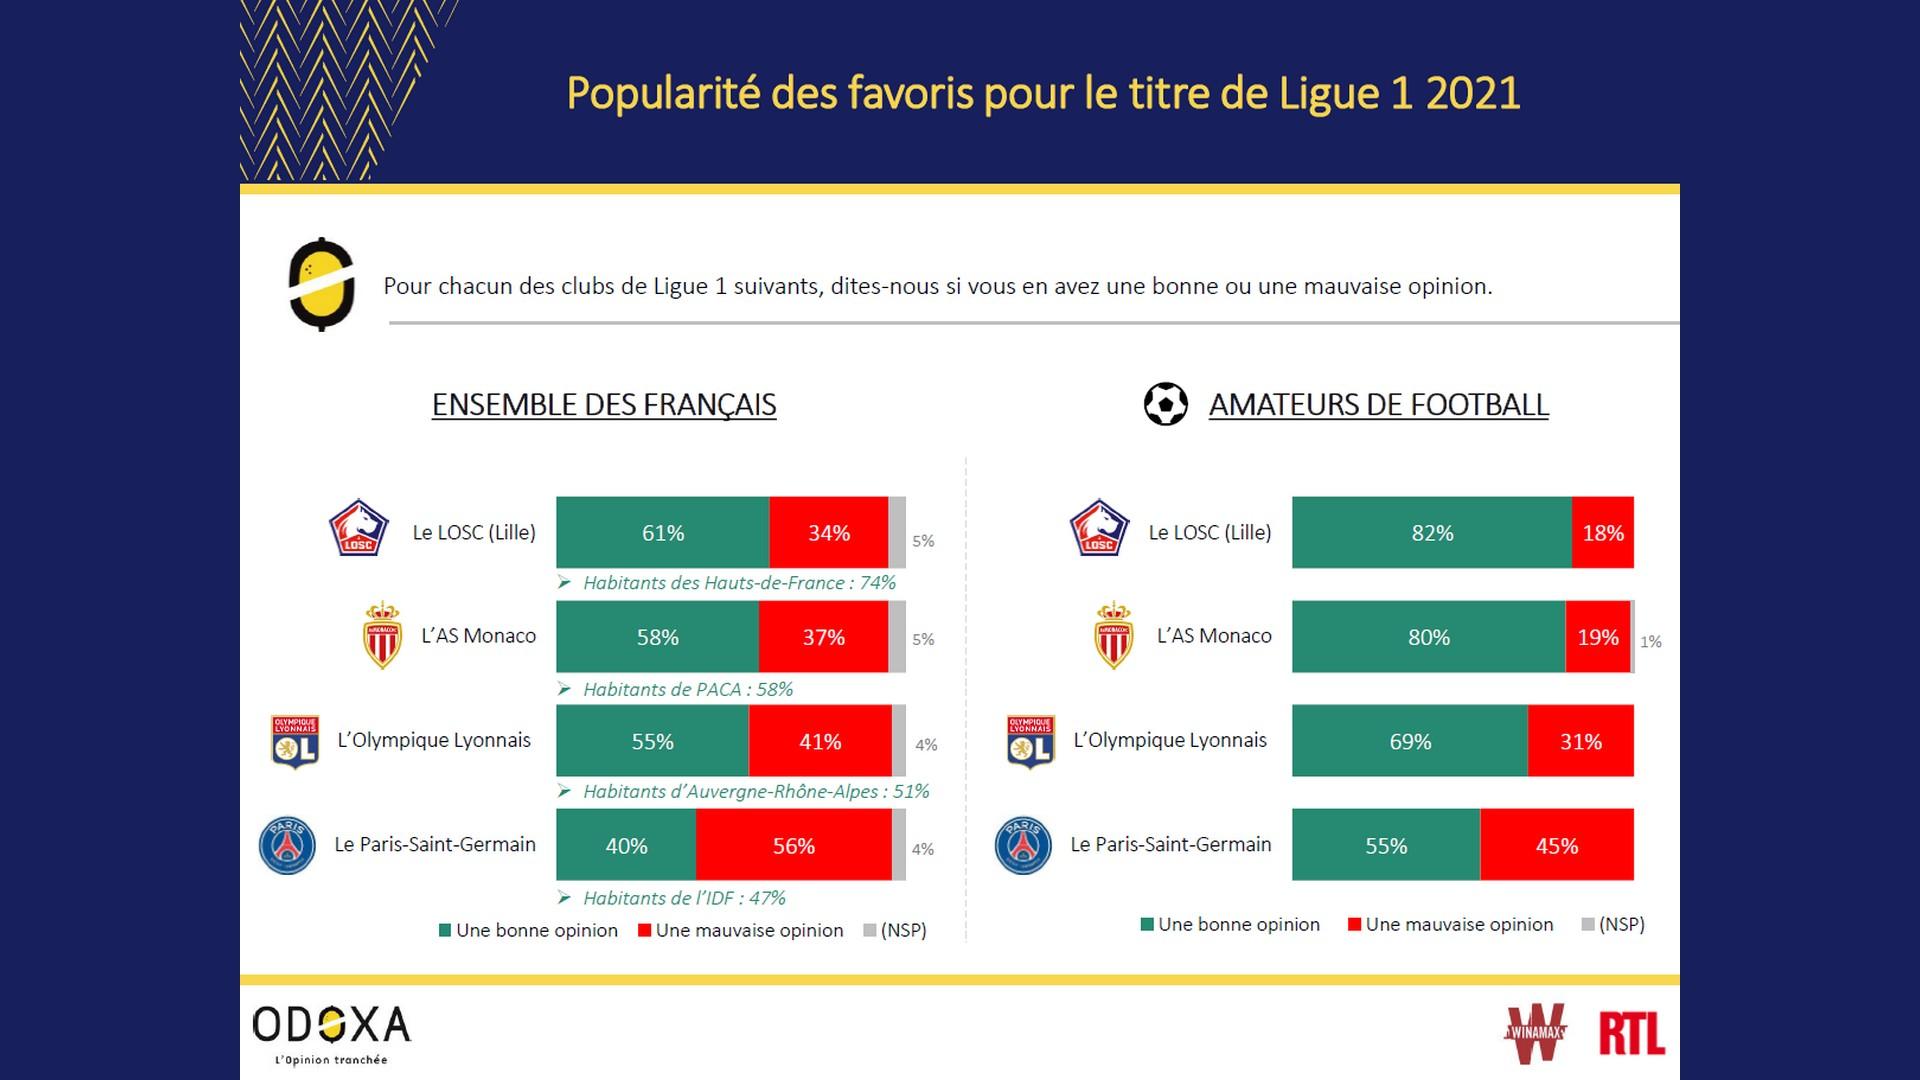 Odoxa x Championnat de France Ligue 1 (avril 2021)